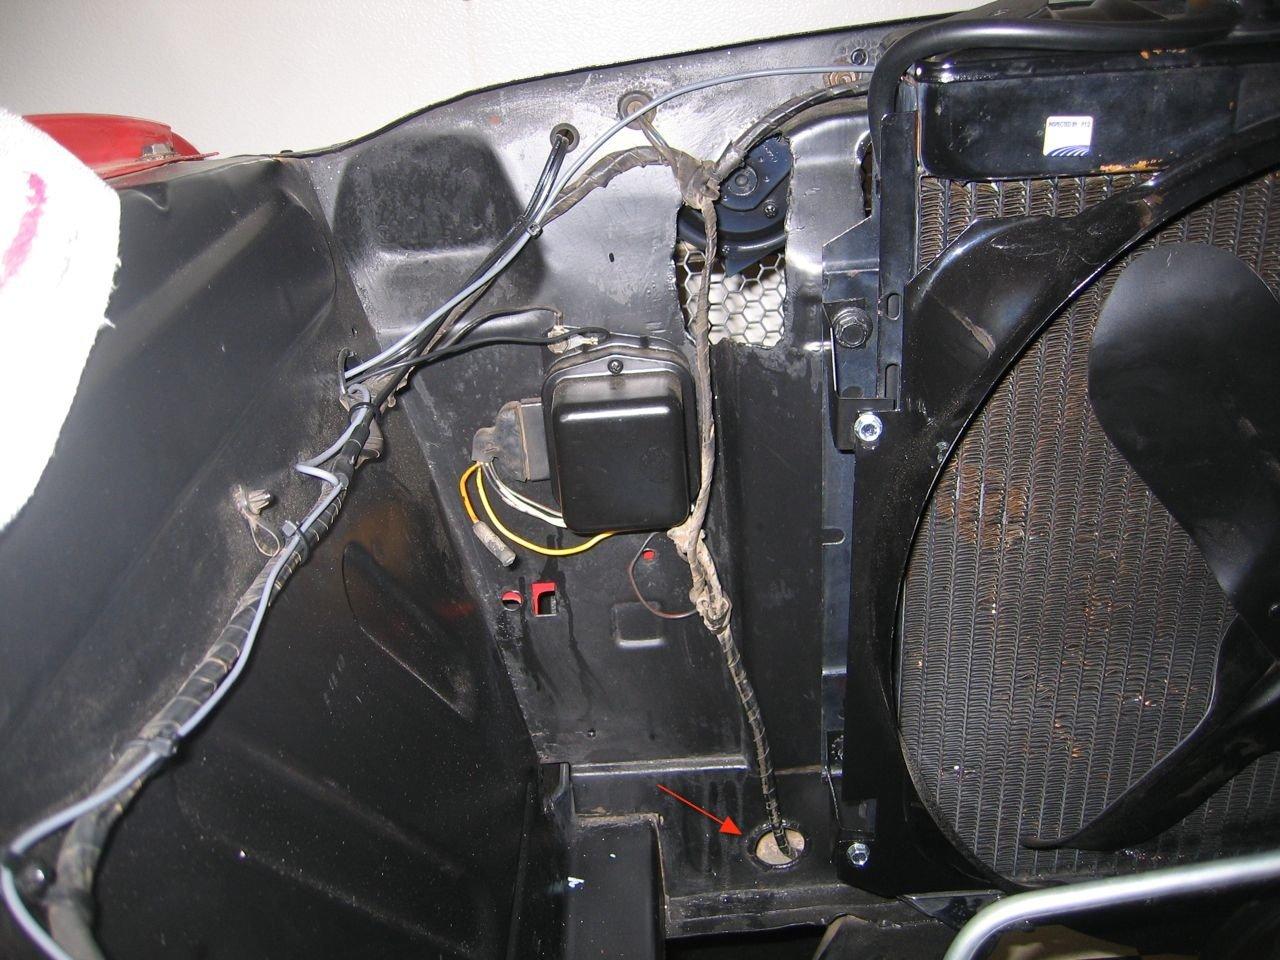 66 mustang headlight wiring harness wiring diagram and hernes mustang headlight wiring harness w o trachometer or fog lights 1968